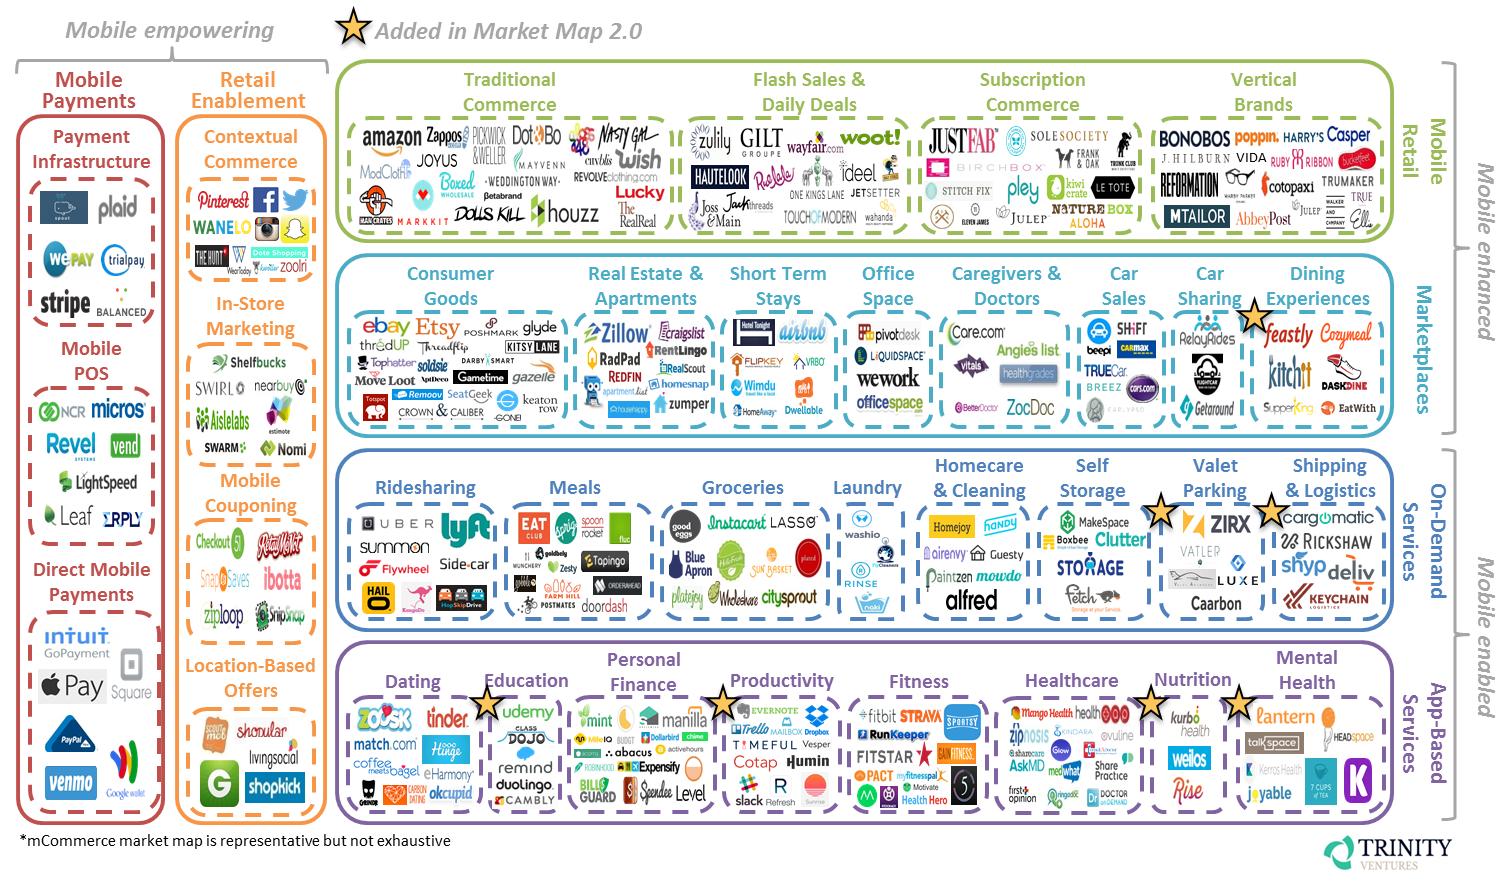 MCommerce-Market-Map-2.0